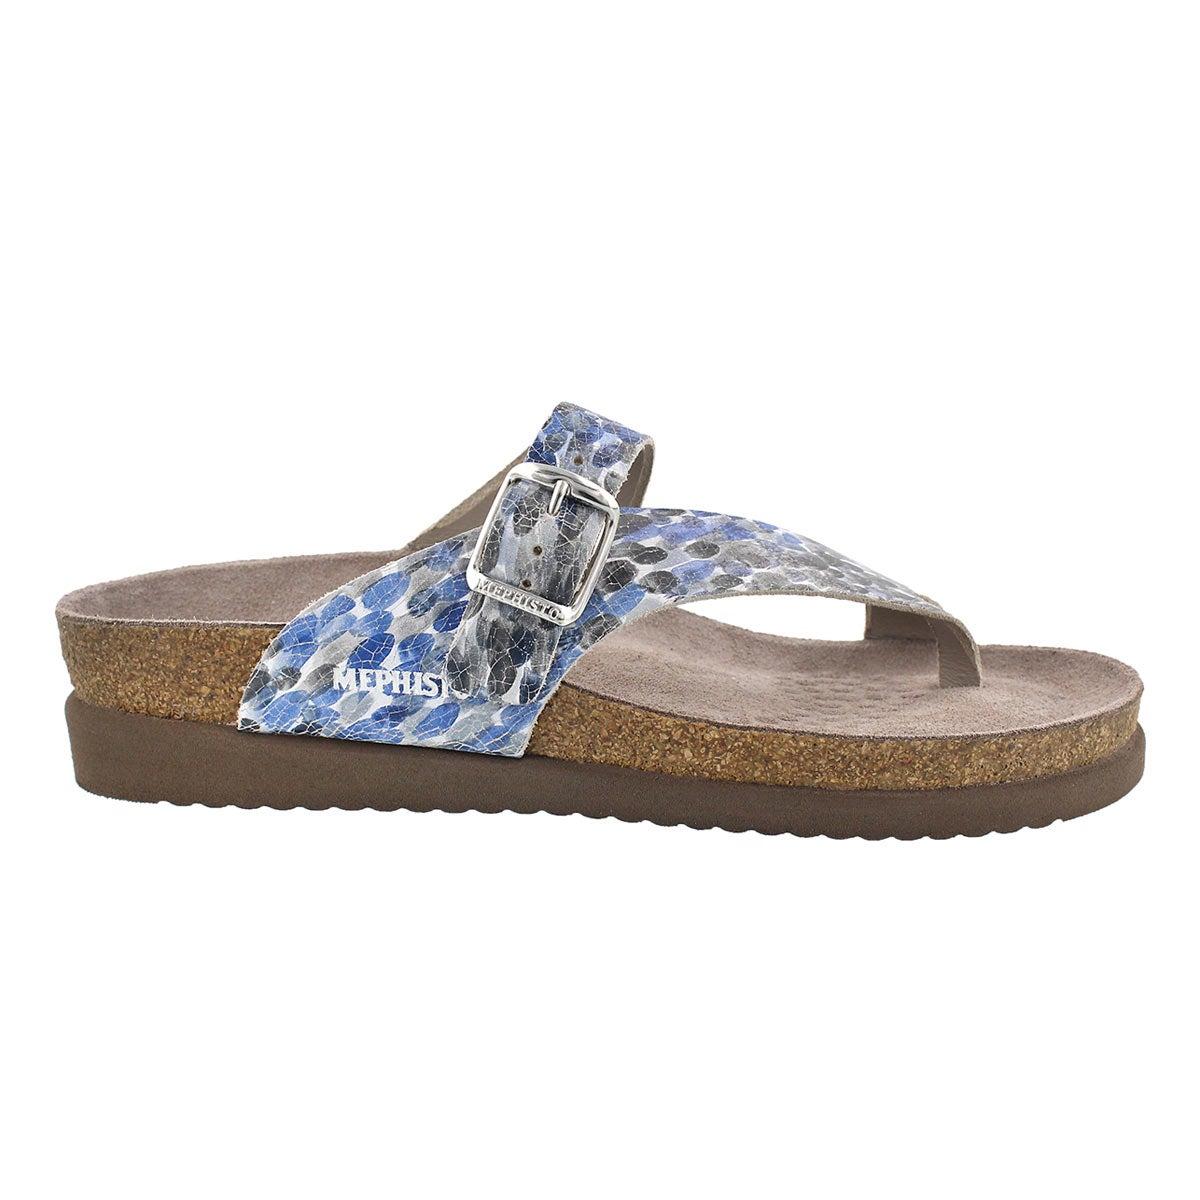 Lds Helen blu multi cork footbed thong